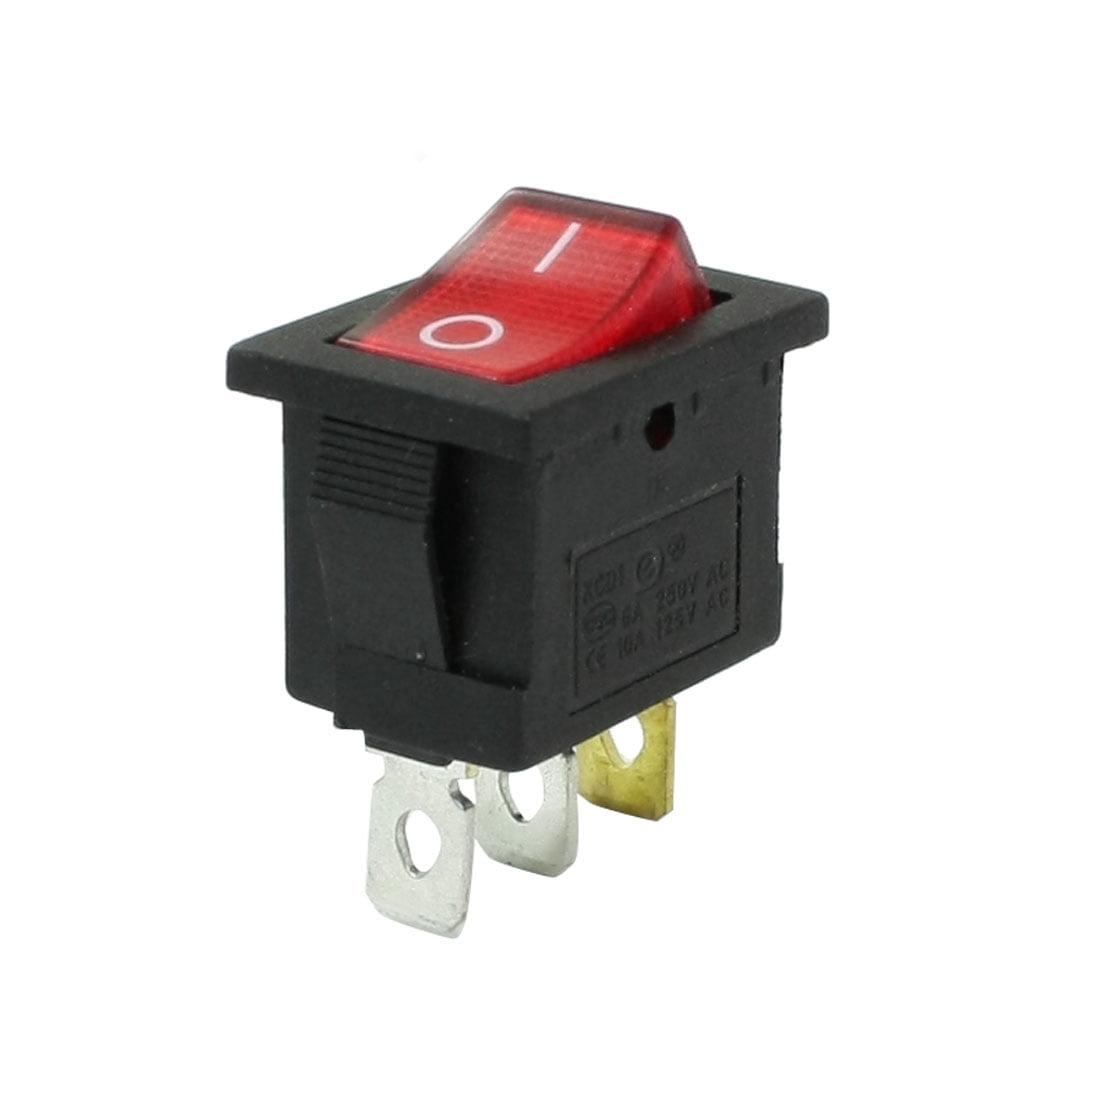 250VAC 6A / 125VAC 10A 3-Pin Red Light Lamp SPST On Off Rocker Switch